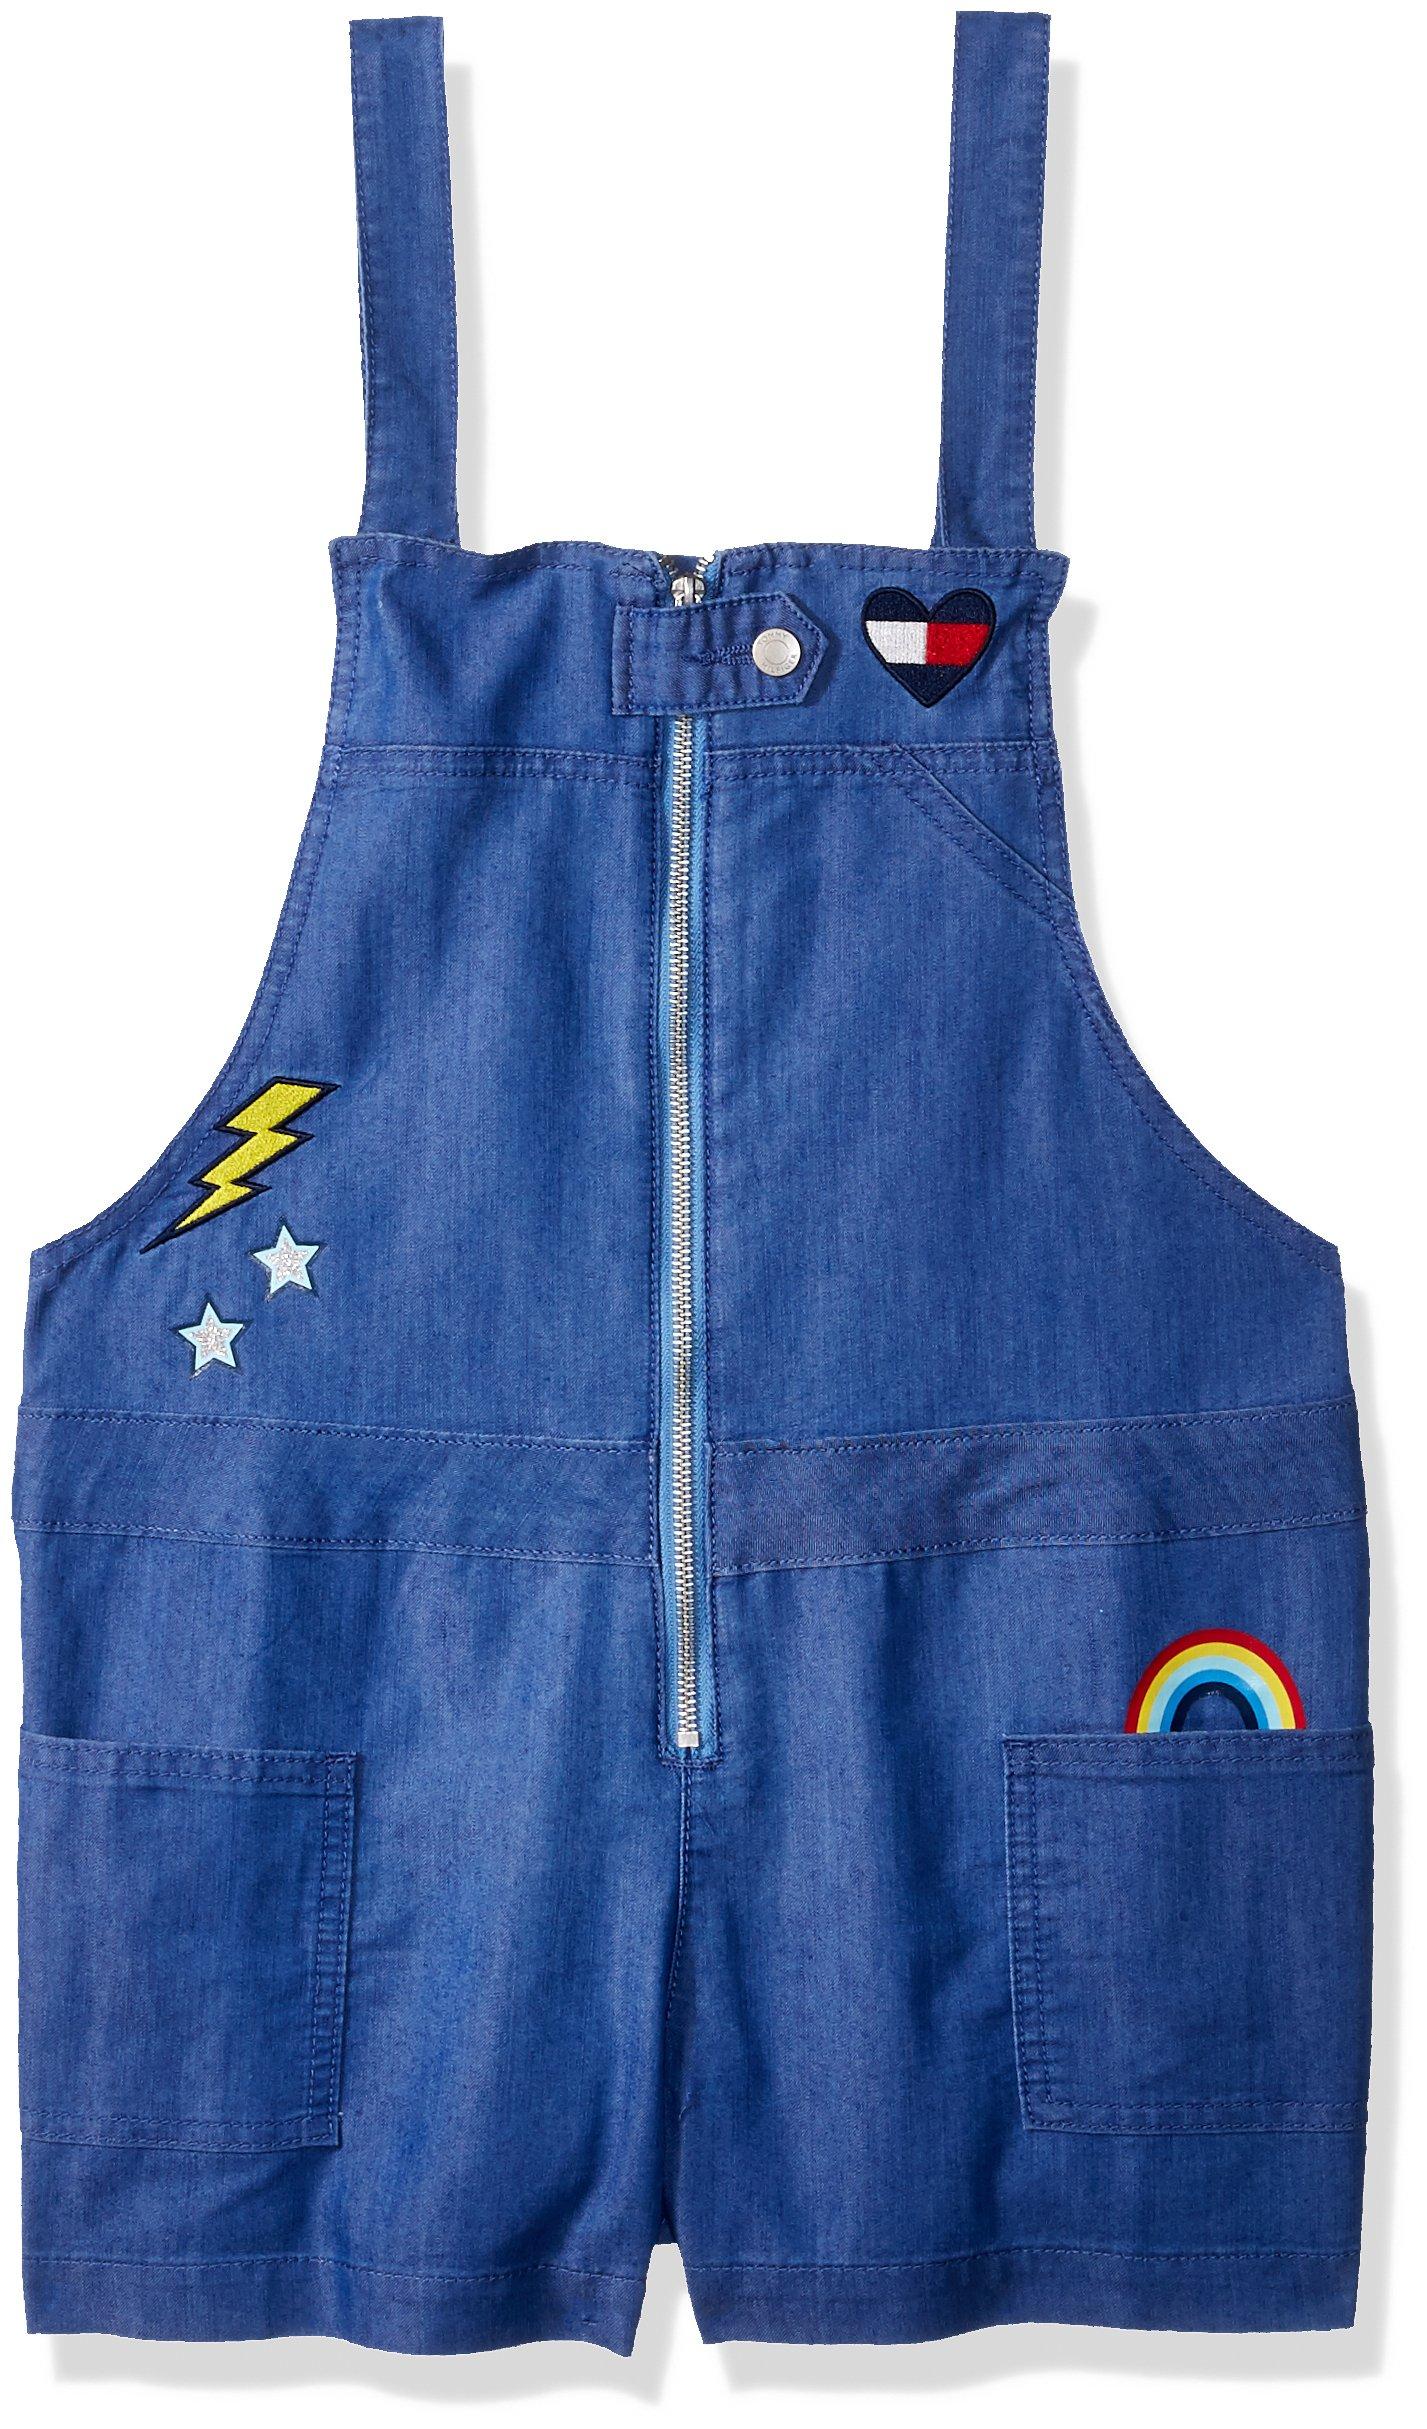 Tommy Hilfiger Big Girls' Denim Shortall, Twinkle Blue, X-Large